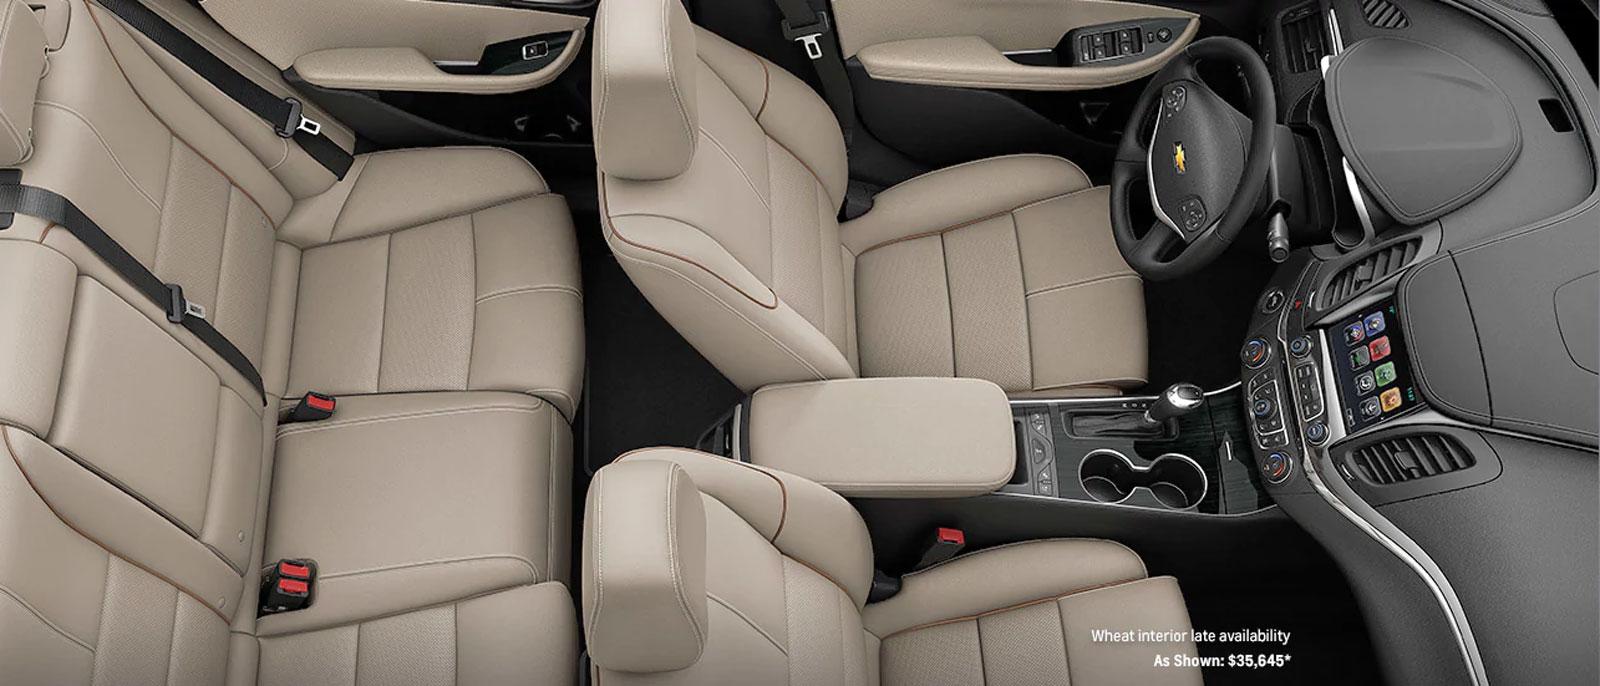 2017 Chevrolet Impala Msrp Mgp Safety Interior Technology More 2005 Chrysler Pt Cruiser Fuel Filter